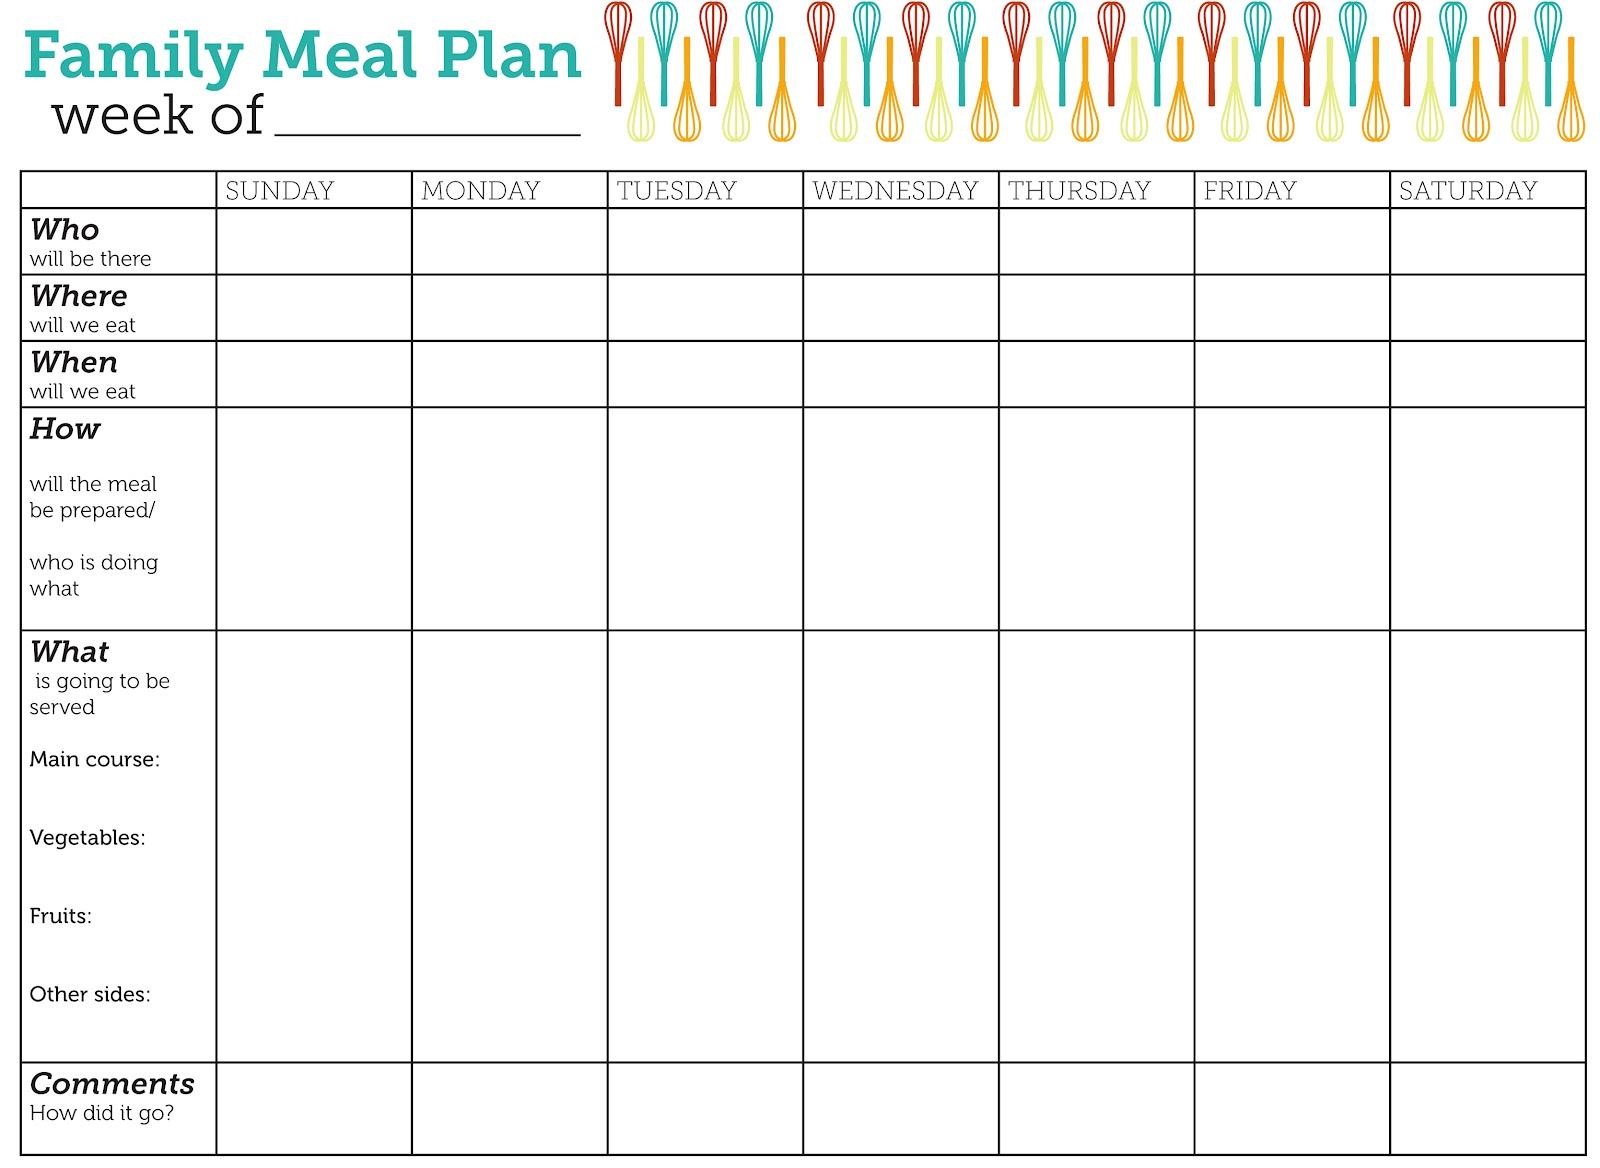 Weekly dinner meal planner template car interior design - Printable Weekly Dinner Meal Planning Chart Car Interior Design